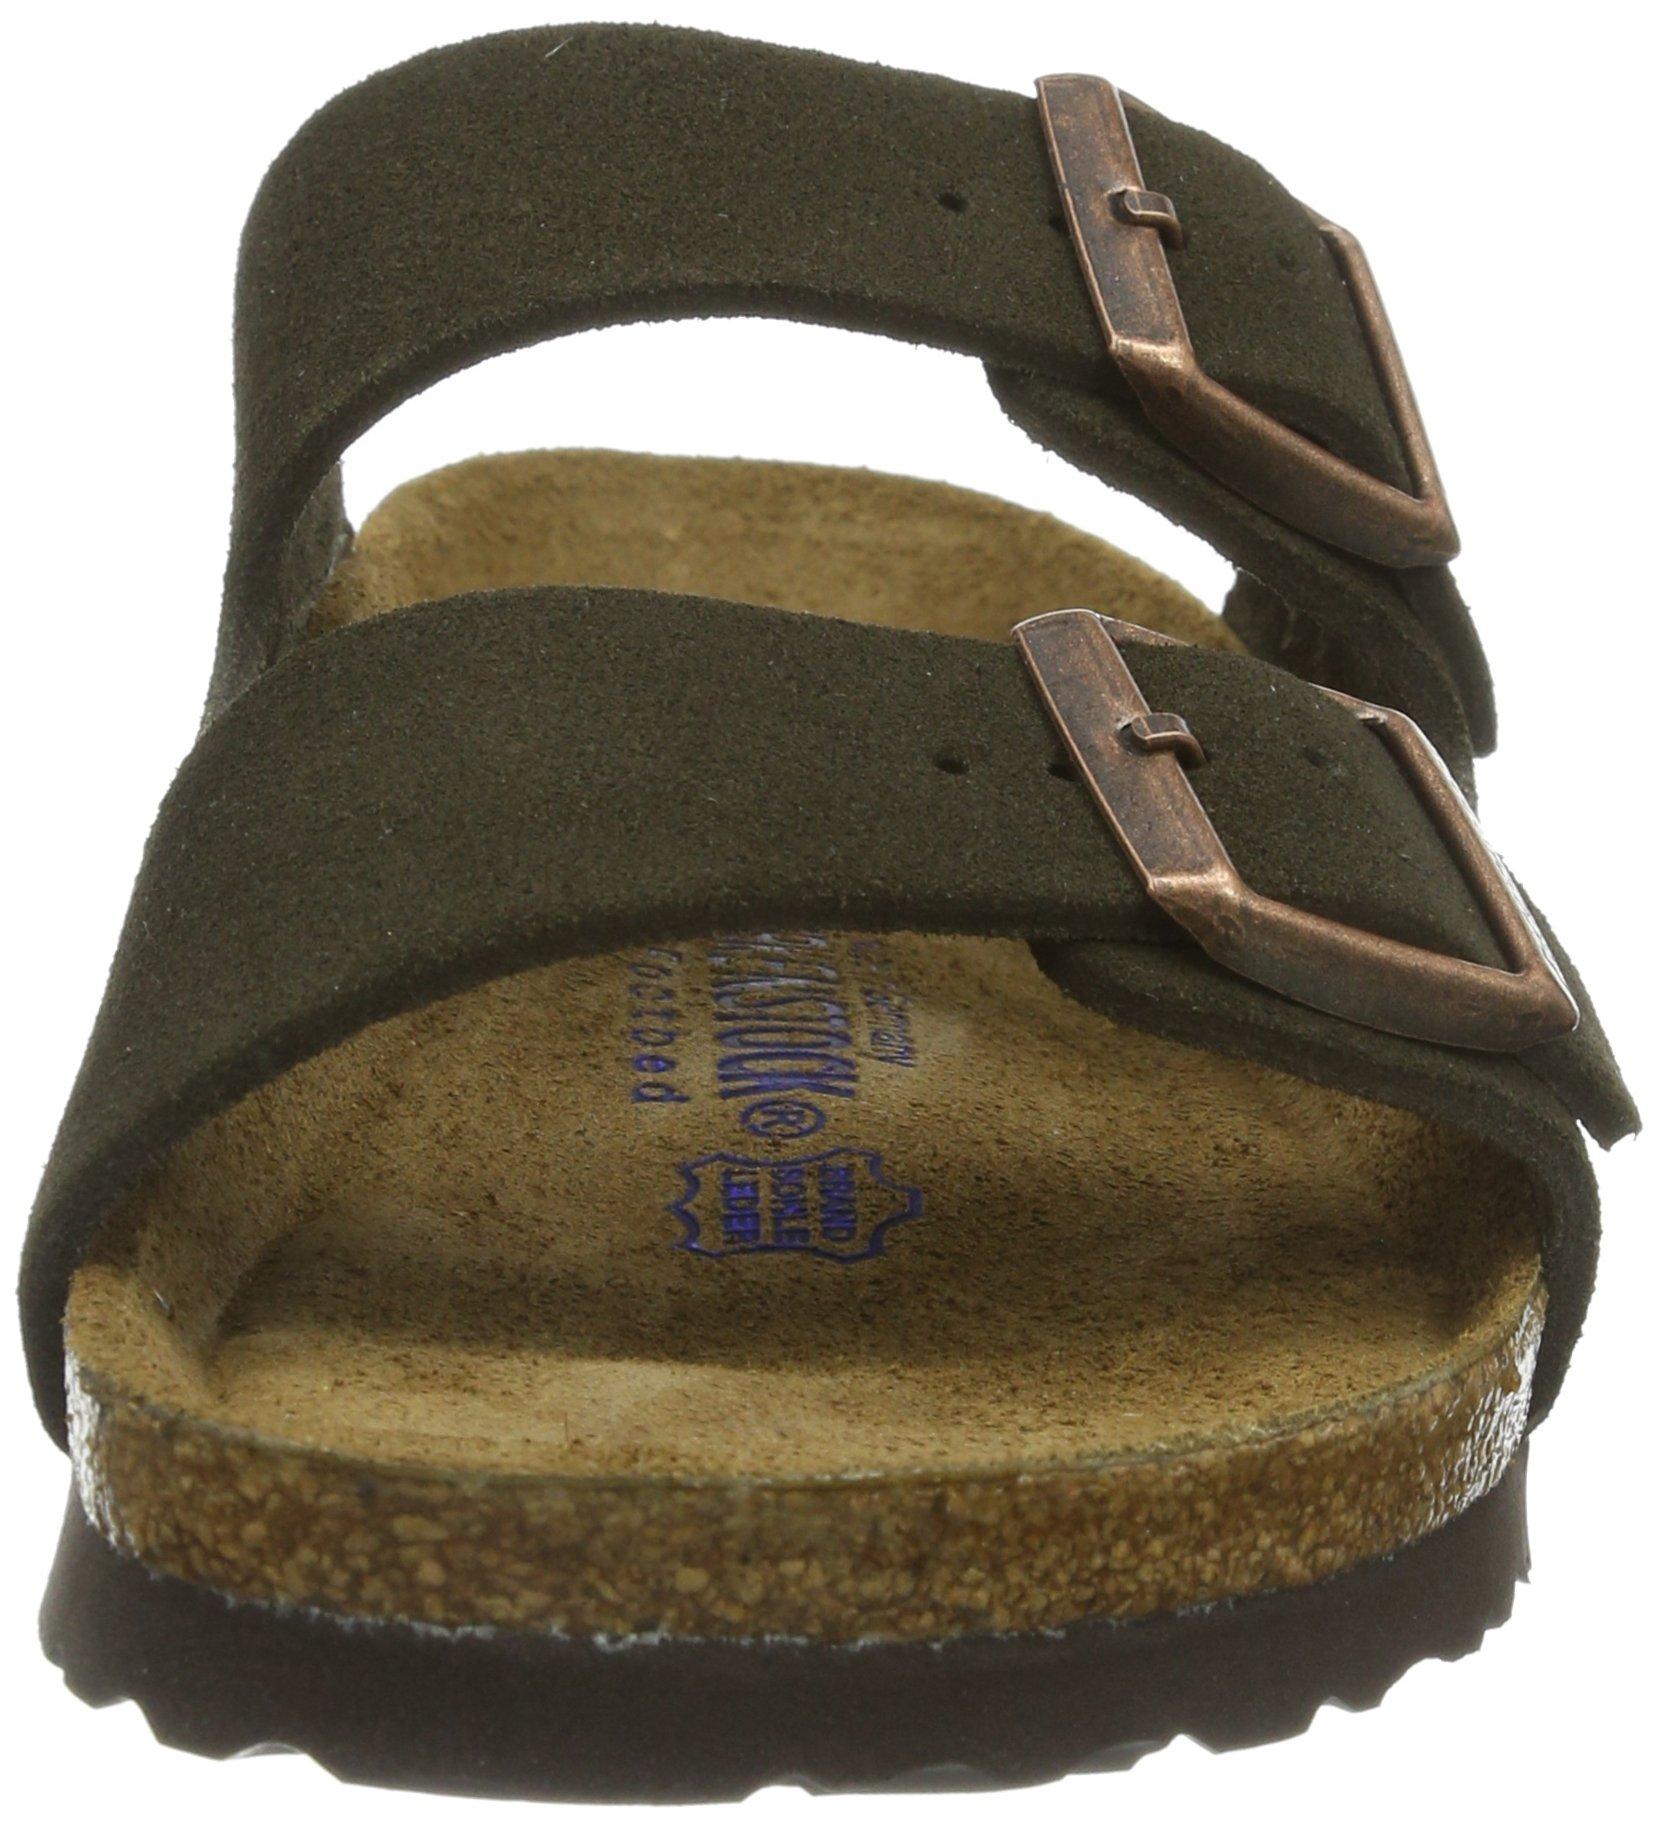 Birkenstock Women´s Arizona Mocha Suede Sandals 37 N EU N 951313 by Birkenstock (Image #4)